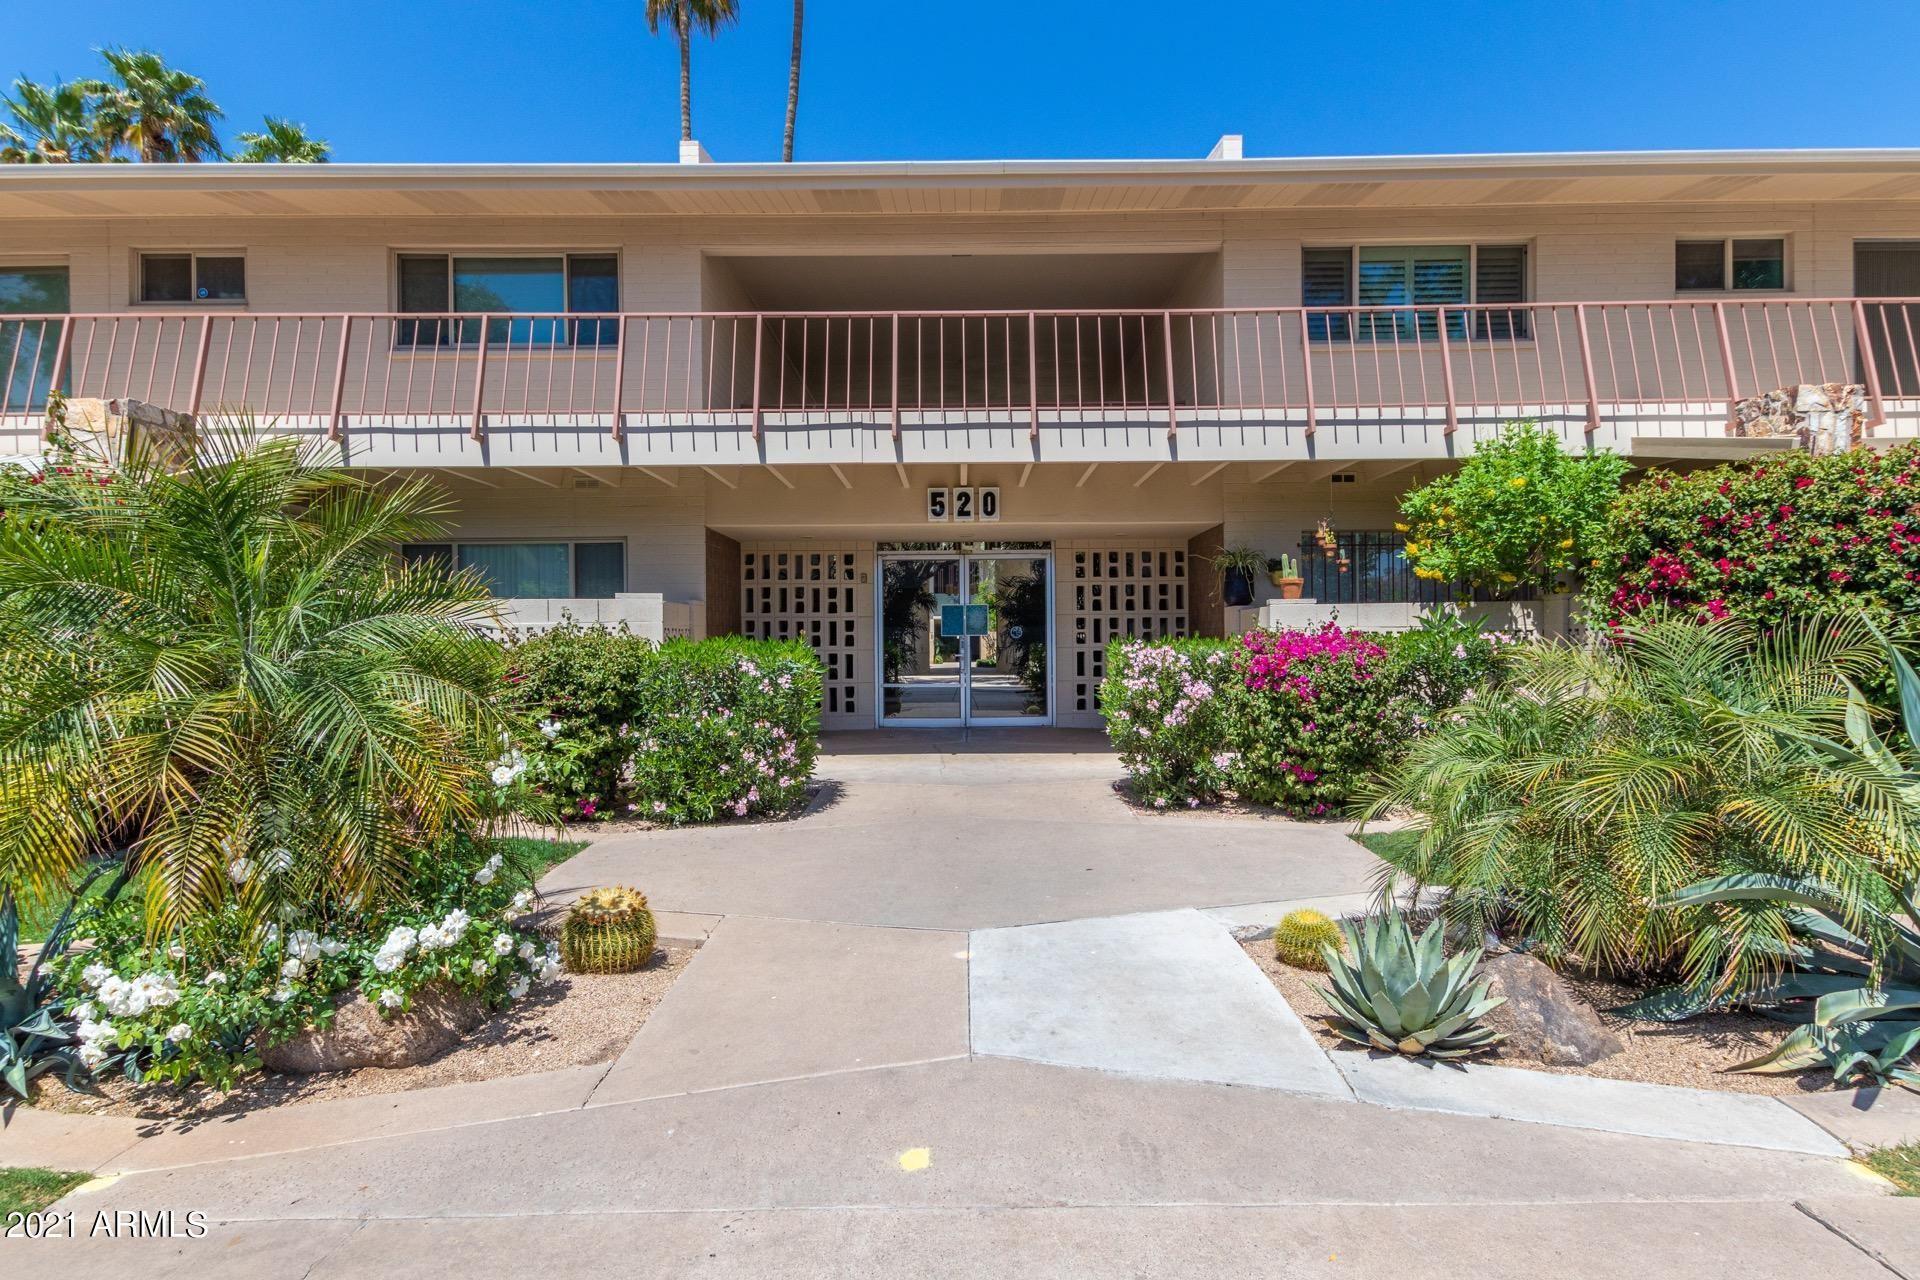 520 W CLARENDON Avenue #G2, Phoenix, AZ 85013 - MLS#: 6222064